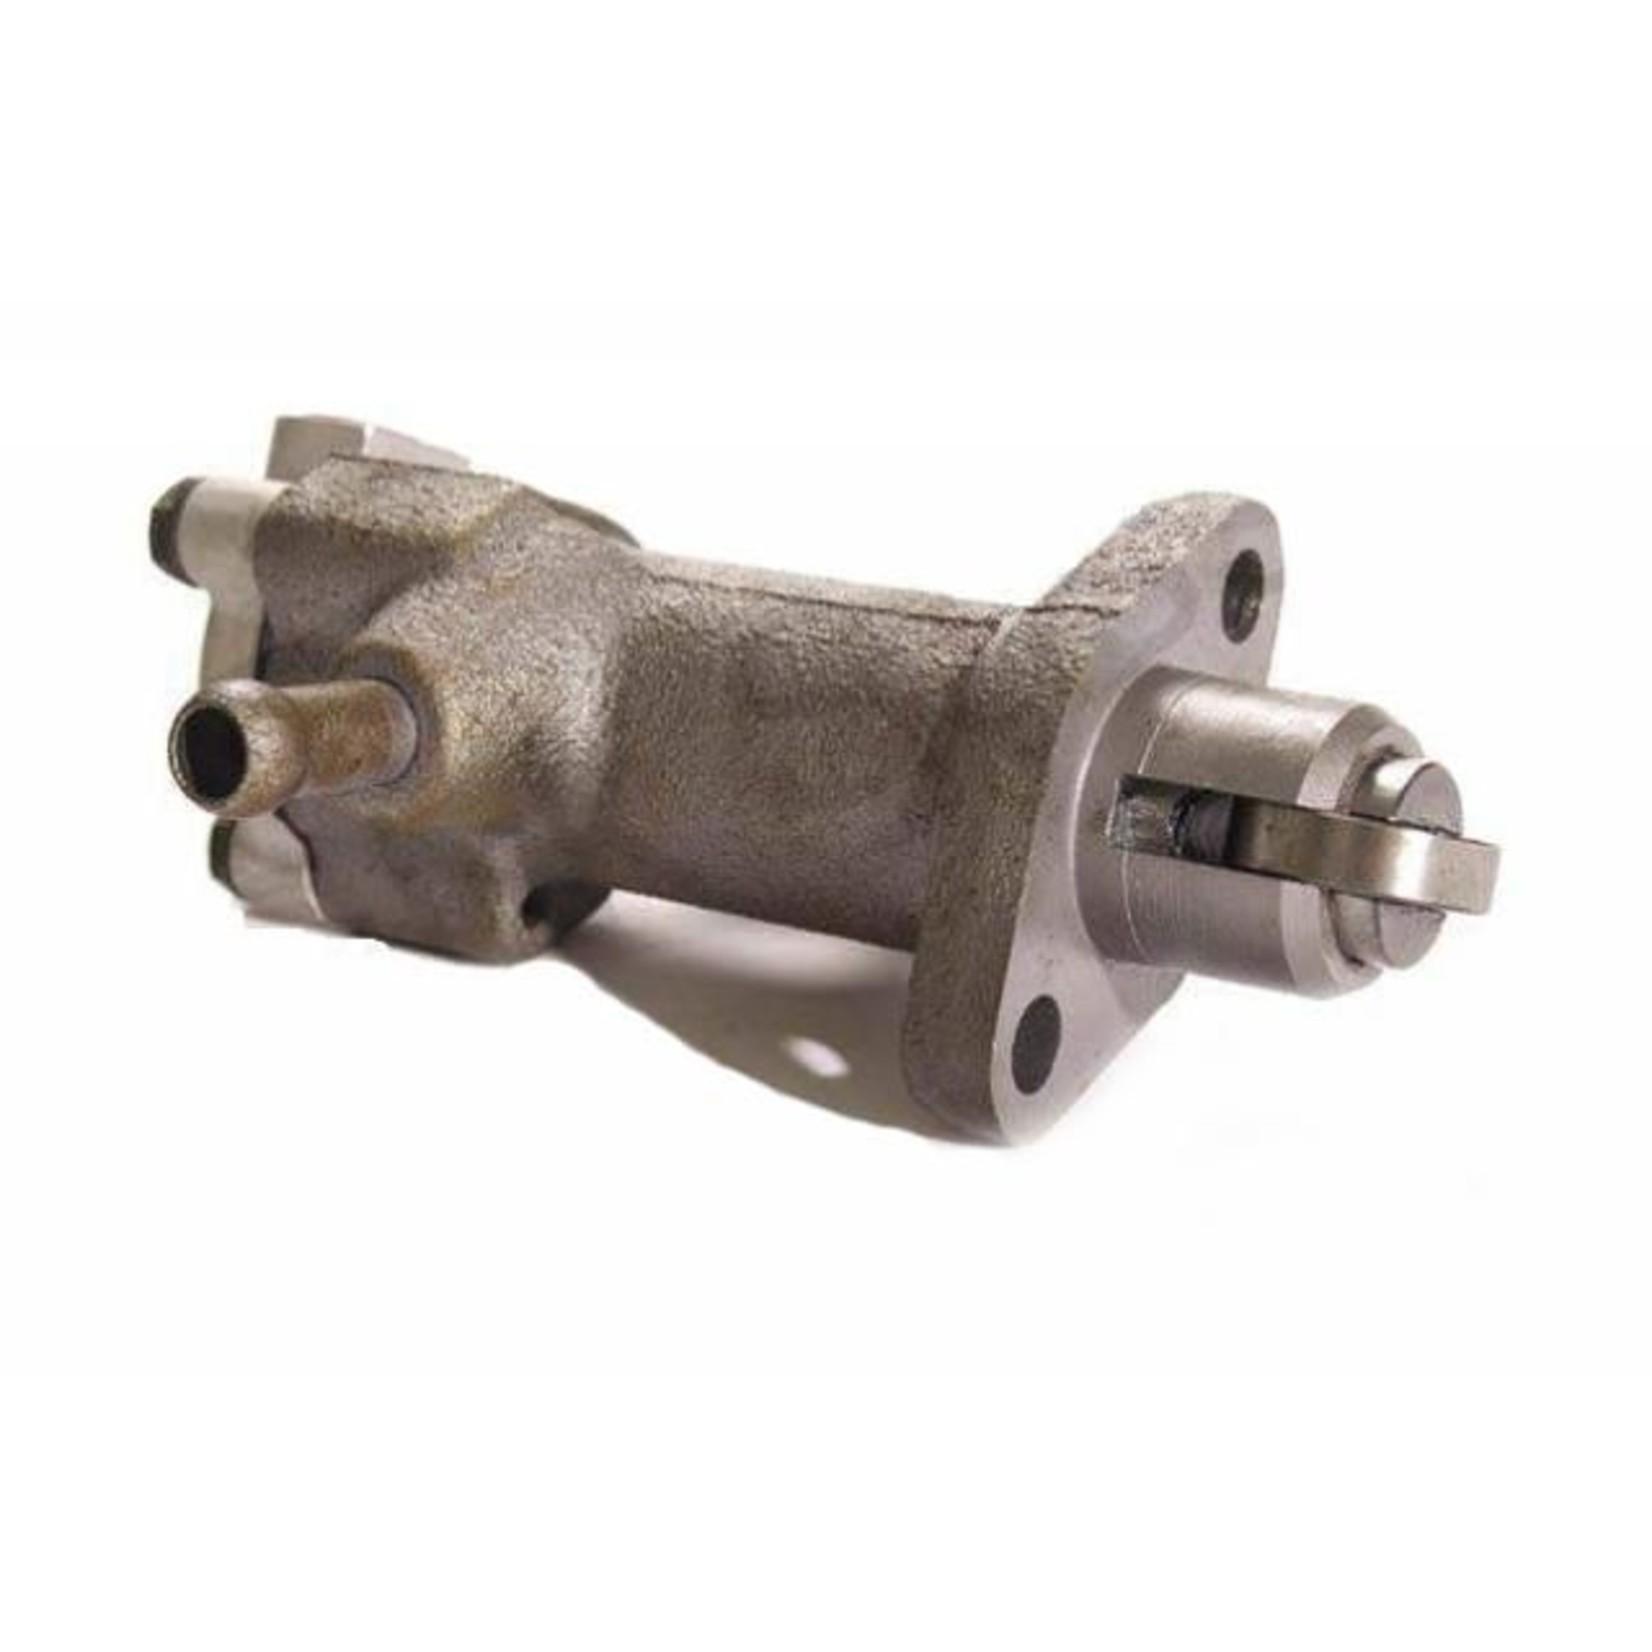 High pressure pump 1 piston reconditioned LHS Nr Org: DM39101C